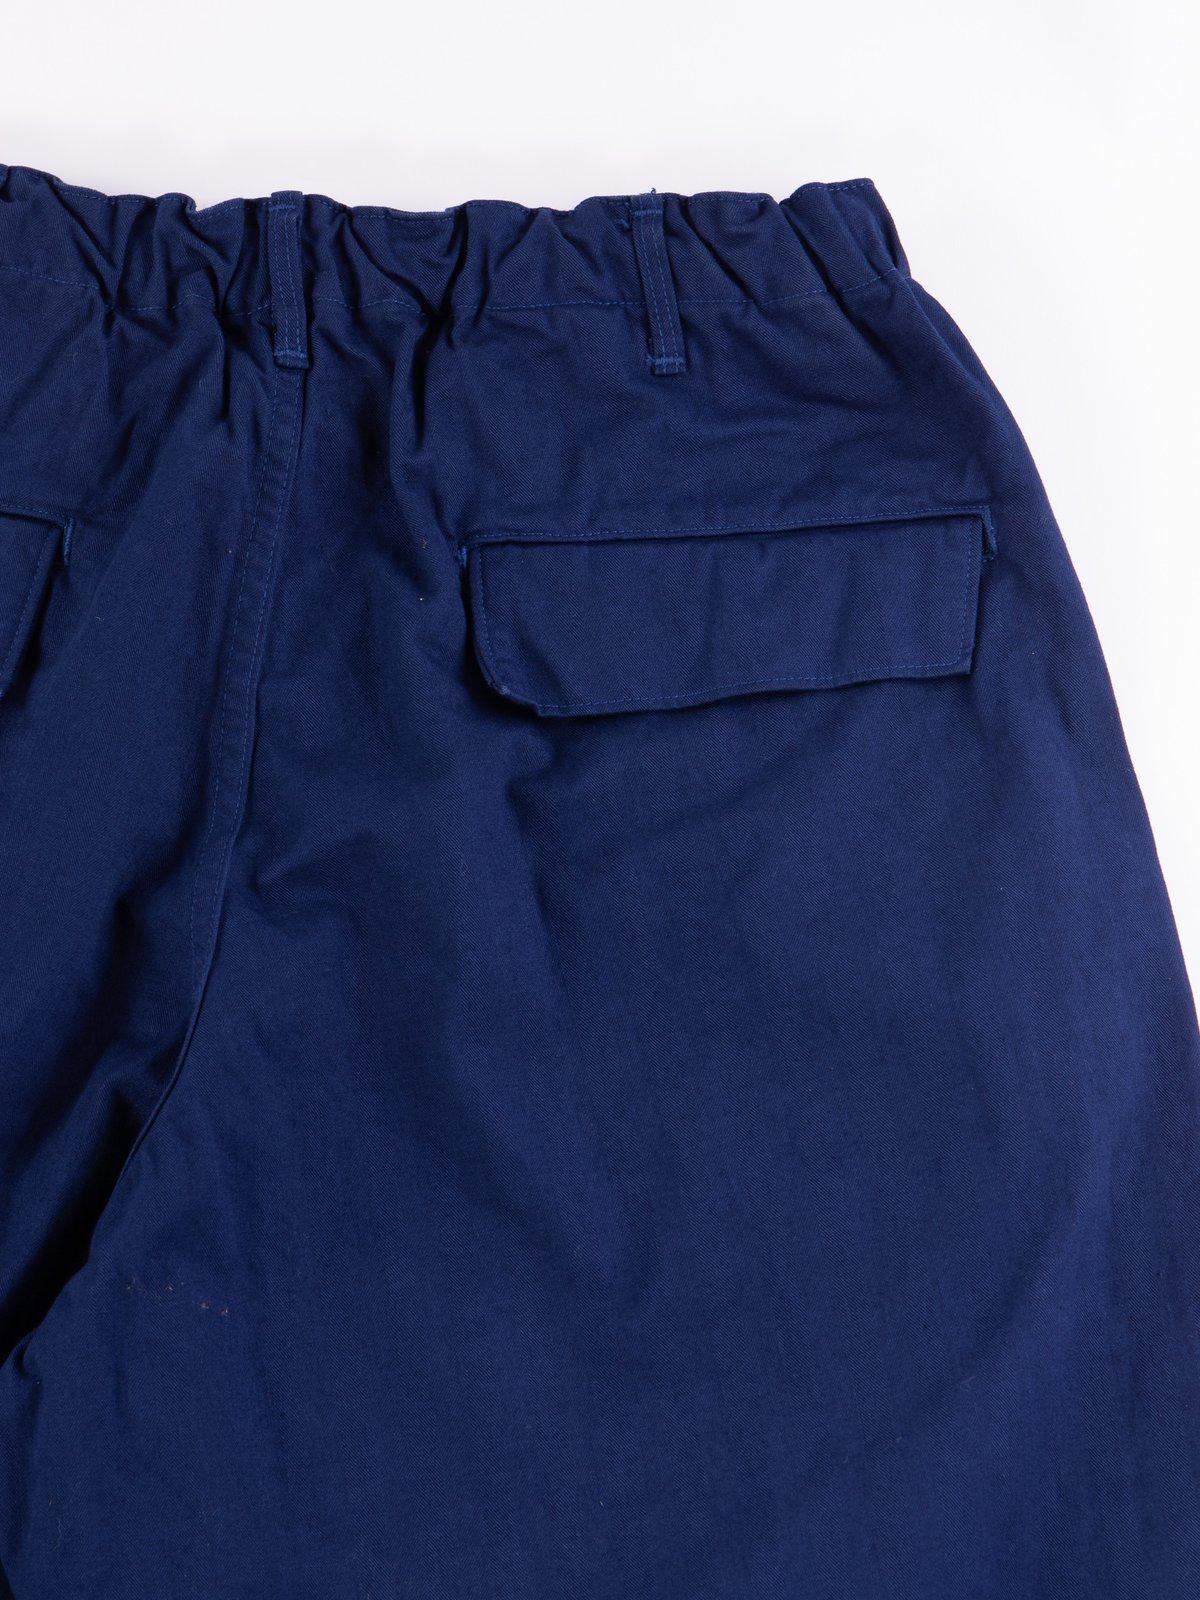 Ink Blue Herringbone TBB Service Pant - Image 6